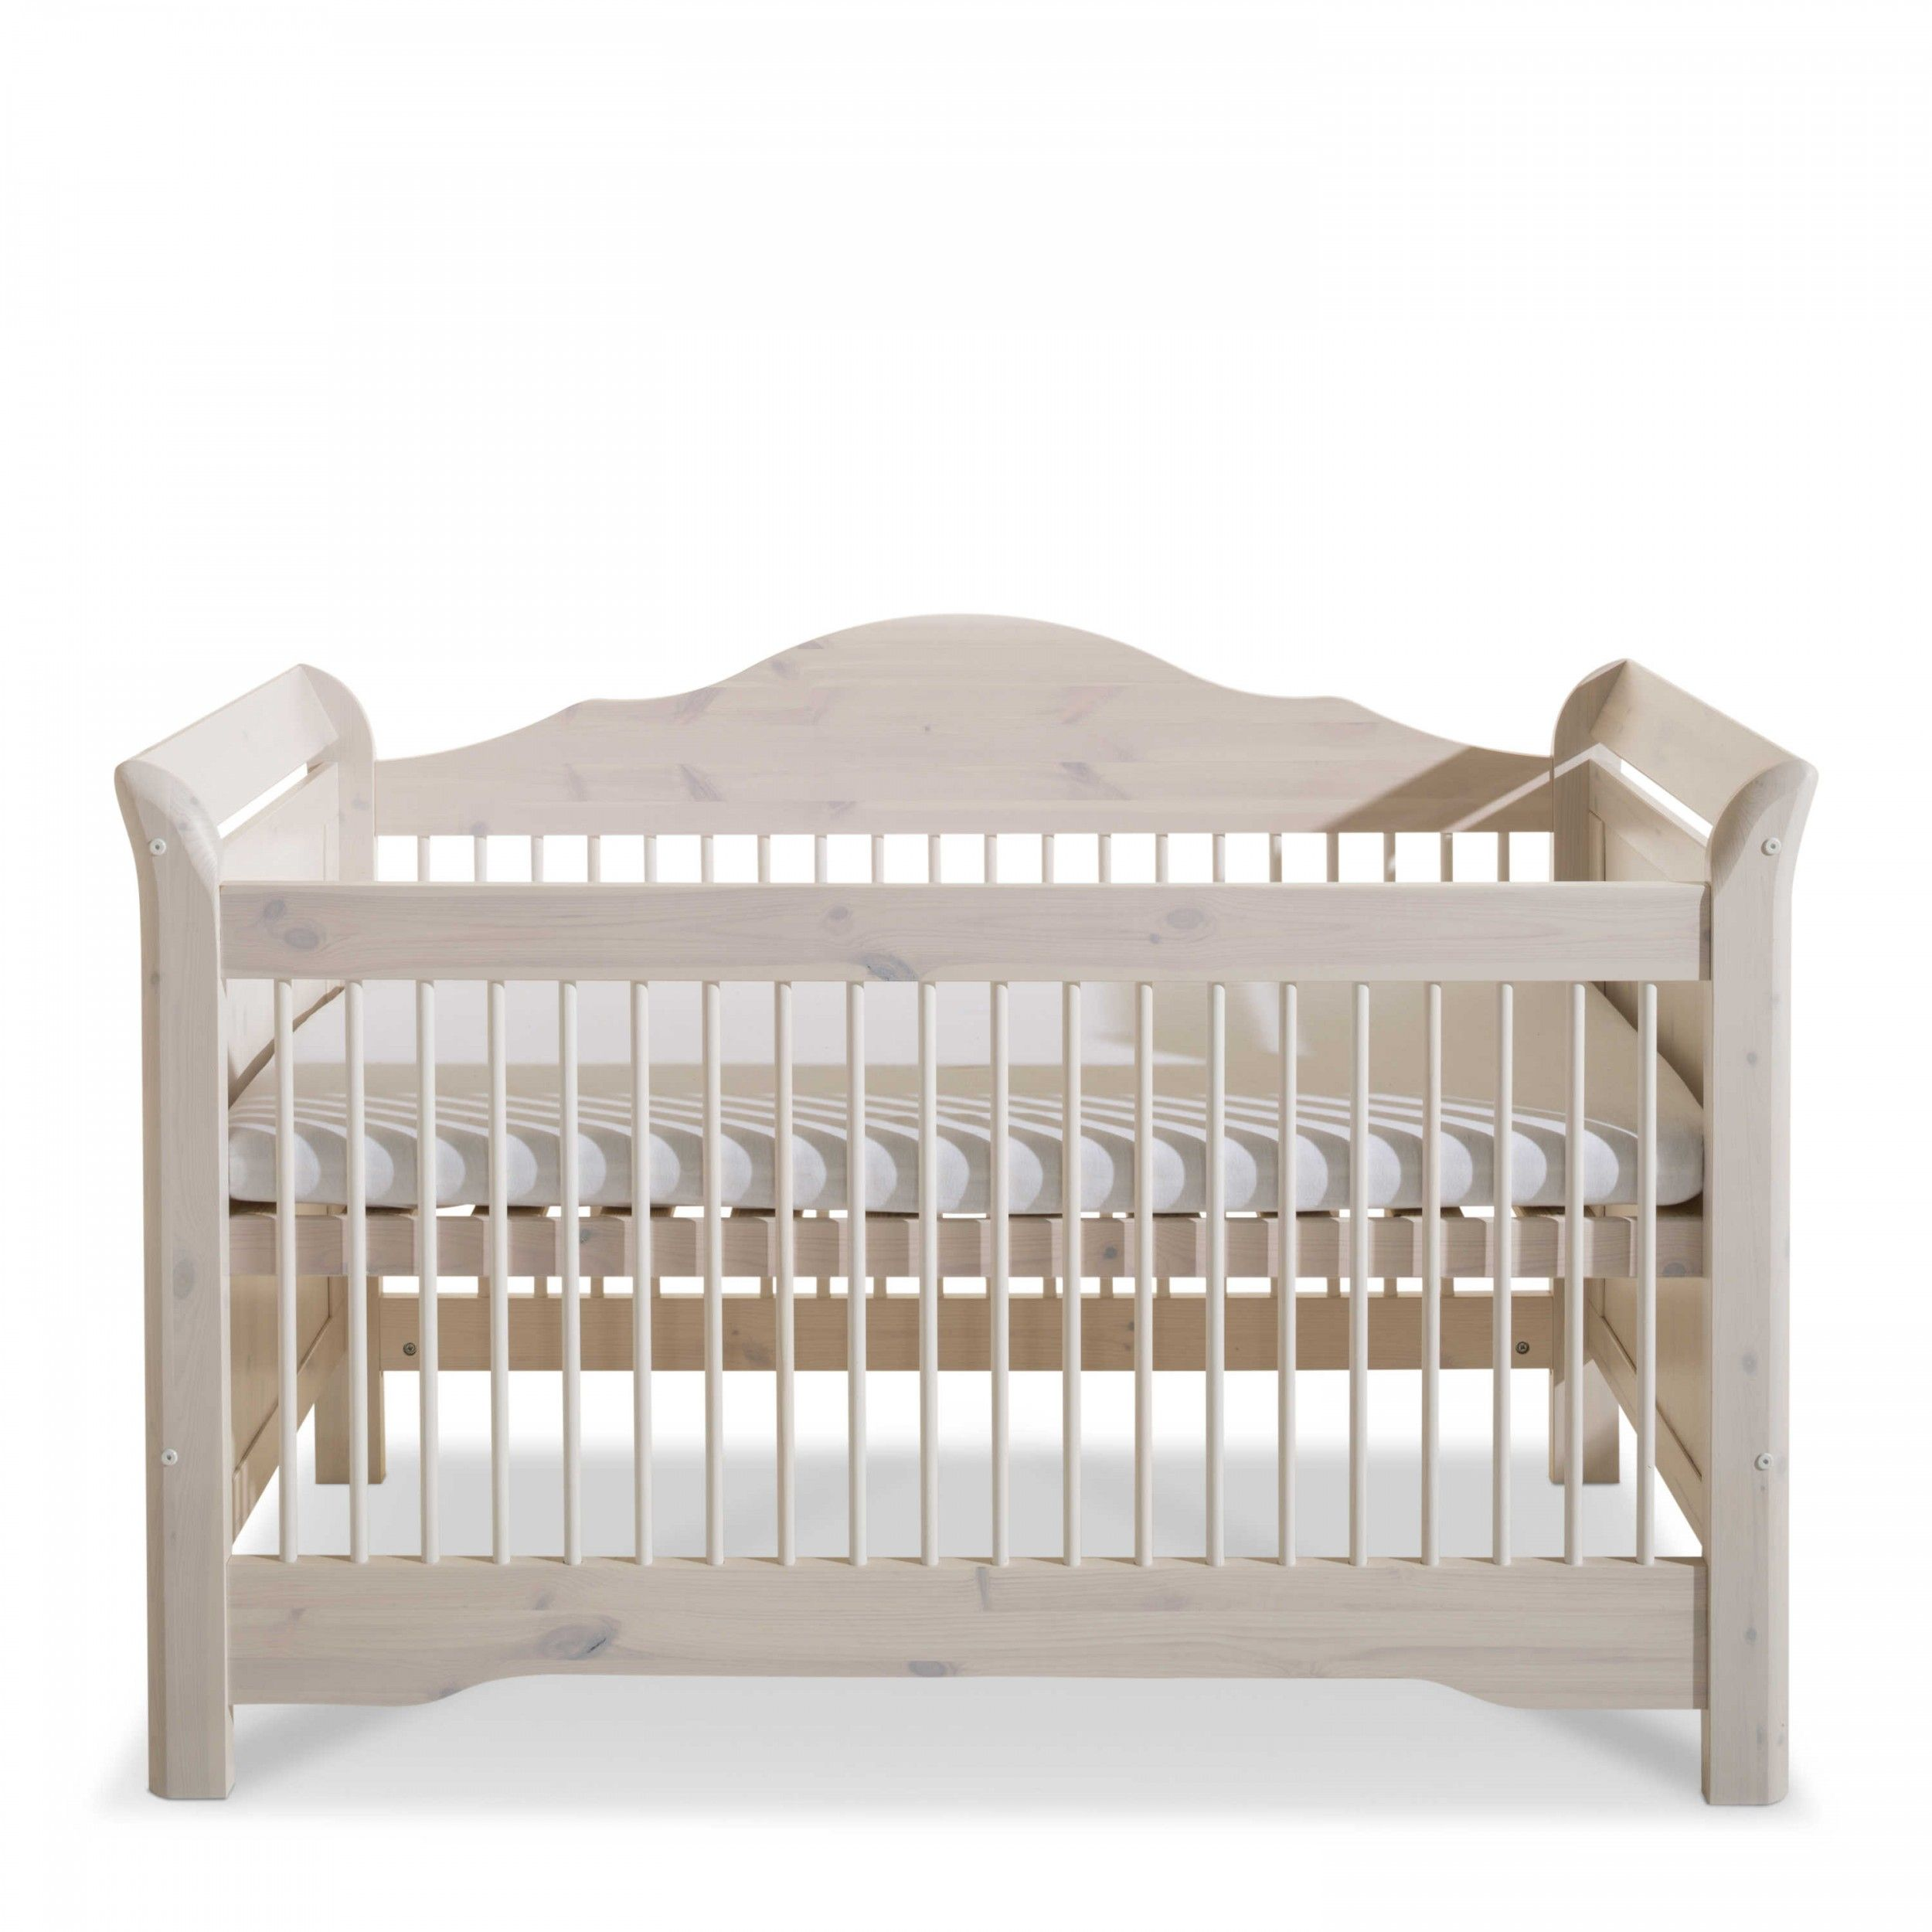 Steens Babyzimmer-Set Lotta 3tlg. - Babyzimmer-Serien - Babyzimmer ... | {Babyzimmer set 9}